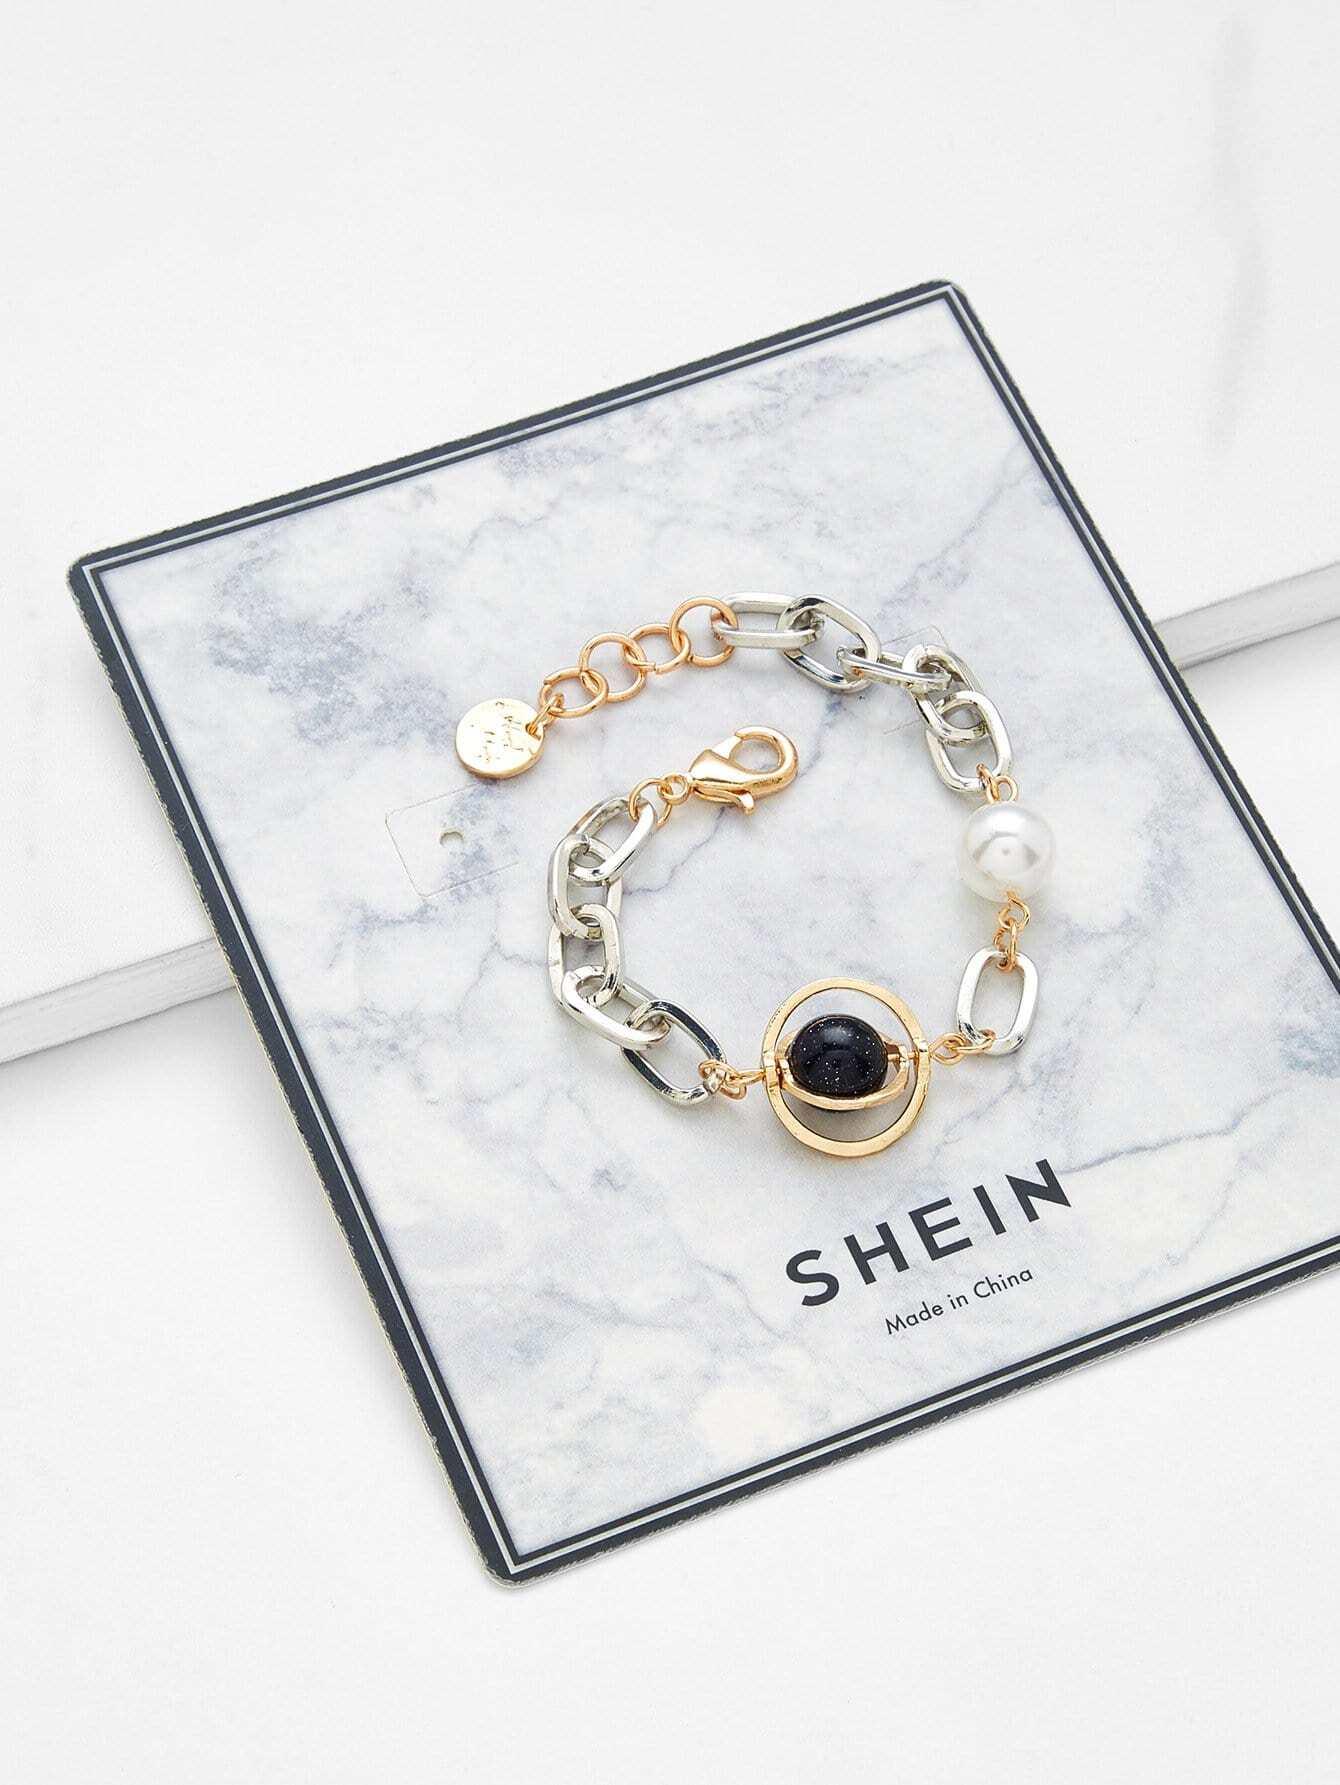 Faux Pearl Chain Bracelet vintage faux pearl chain bracelet for women